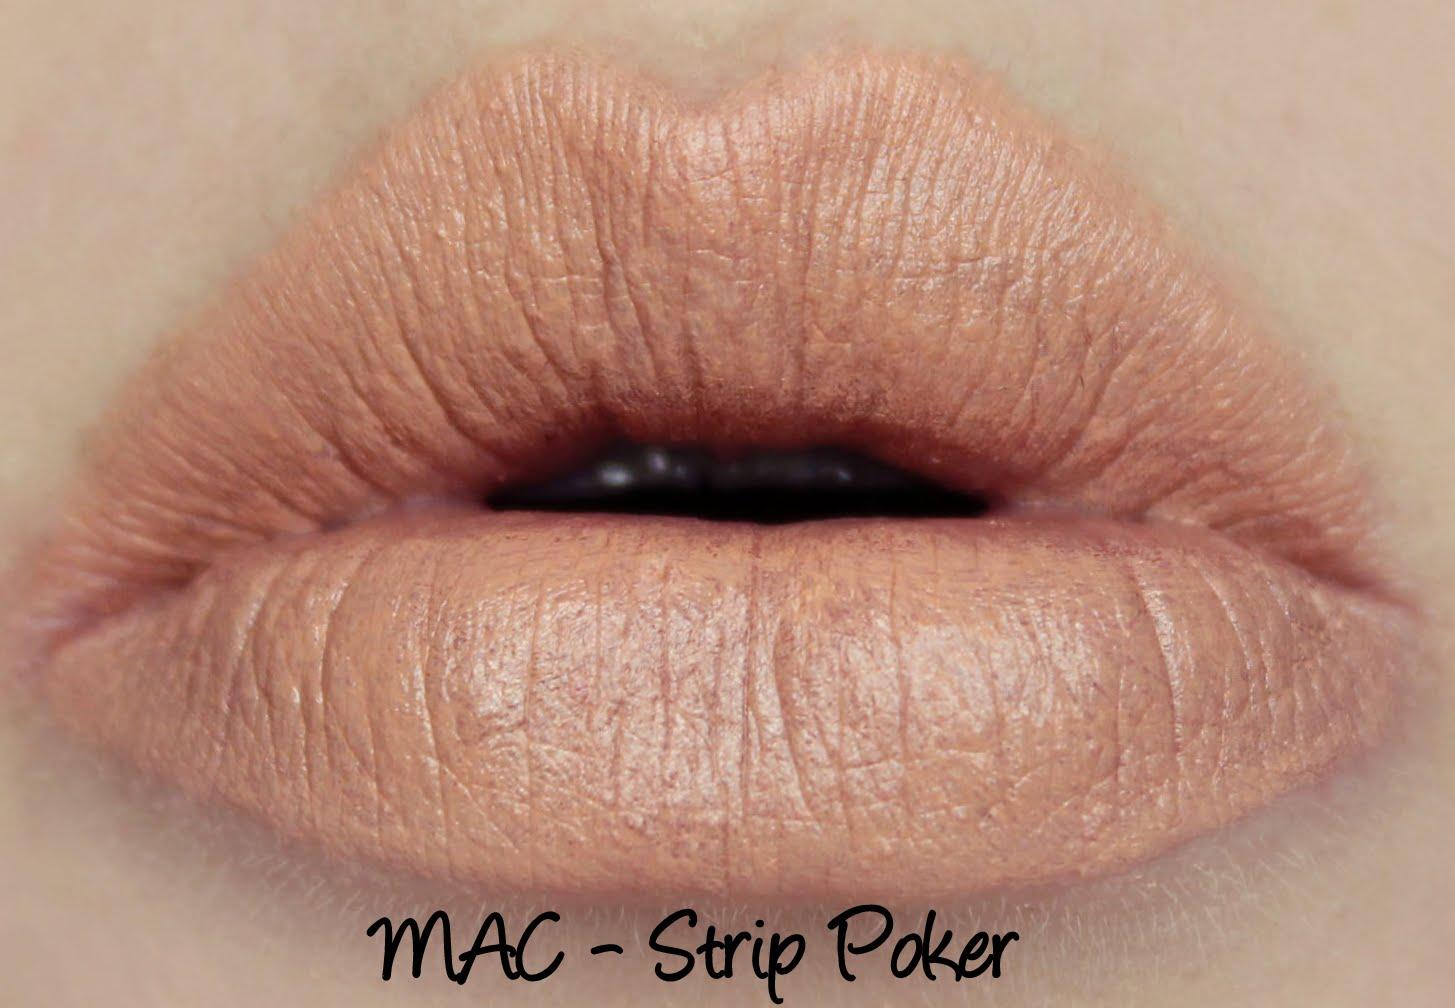 MAC Monday: MAC X Kelly Osborne - Strip Poker Lipstick Swatches & Review